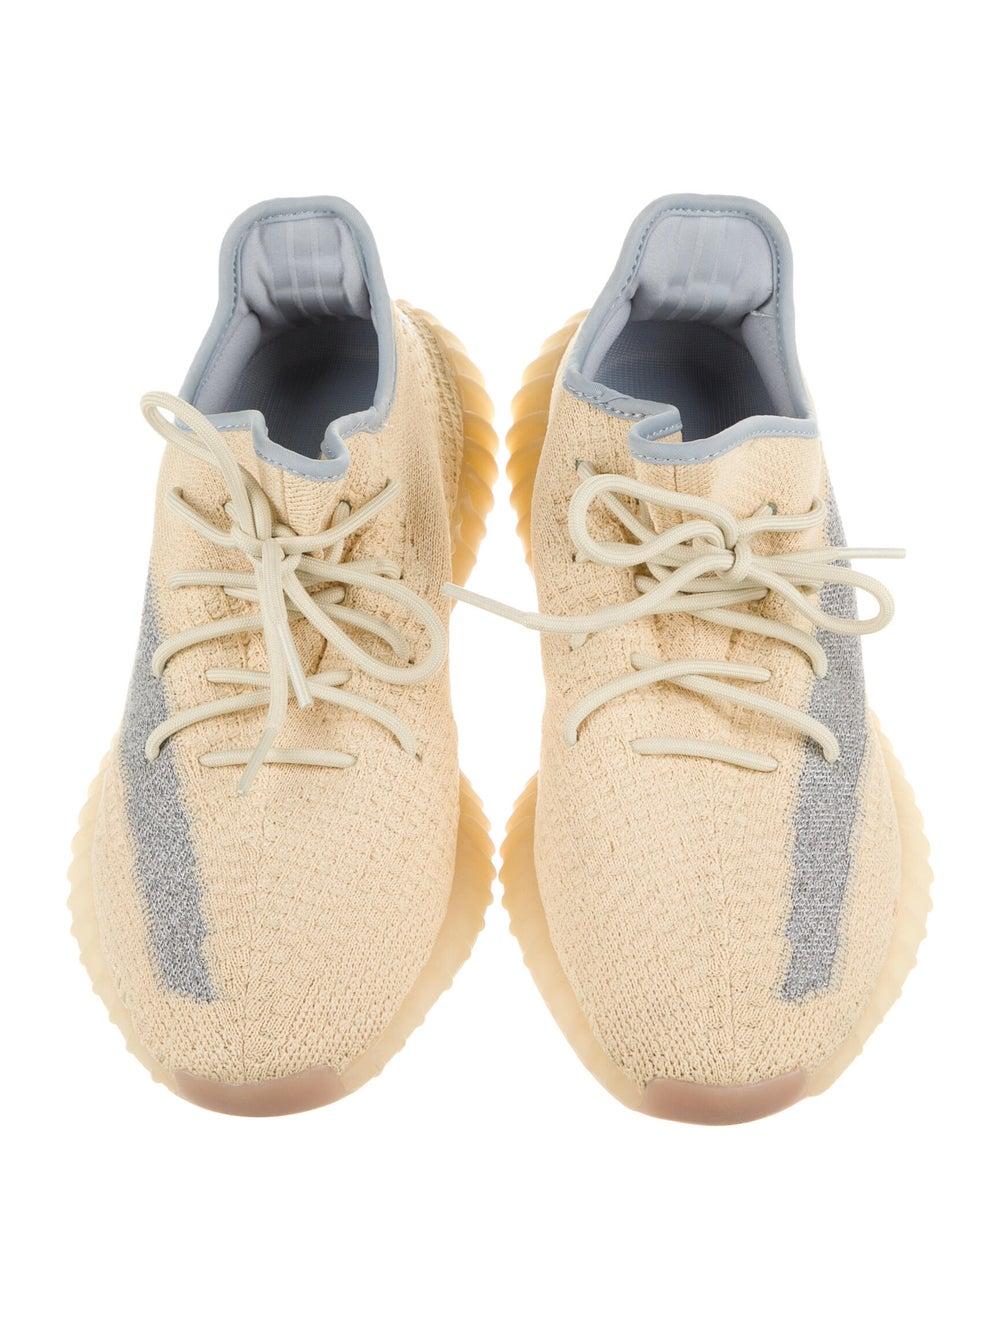 Yeezy x adidas Boost 350 V2 Linen Sneakers Sneake… - image 3